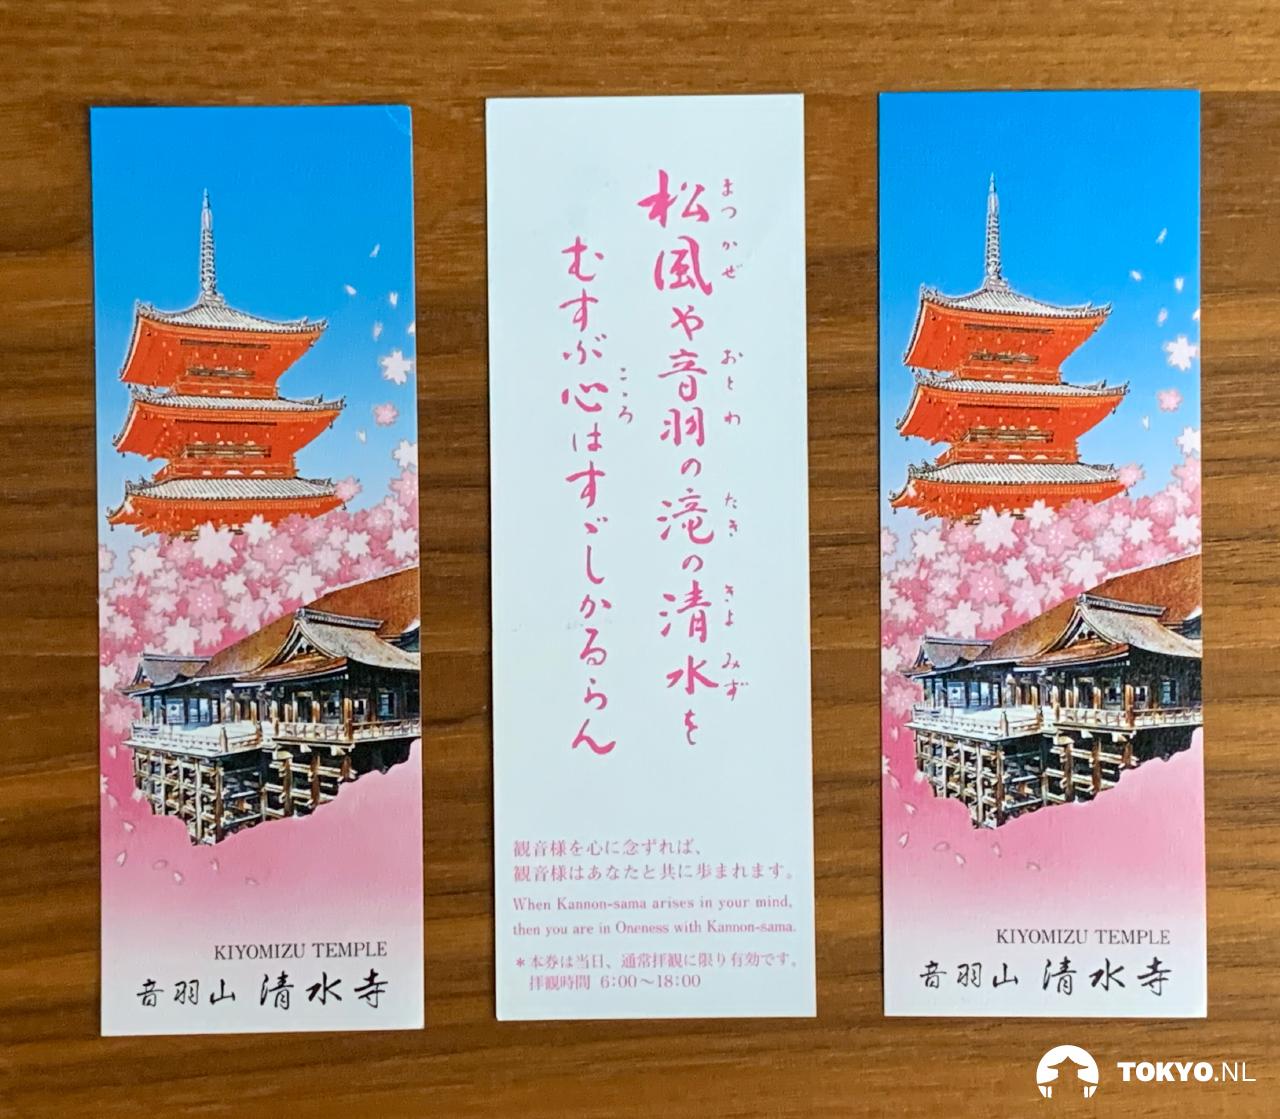 Tickets Kiyomizu temple